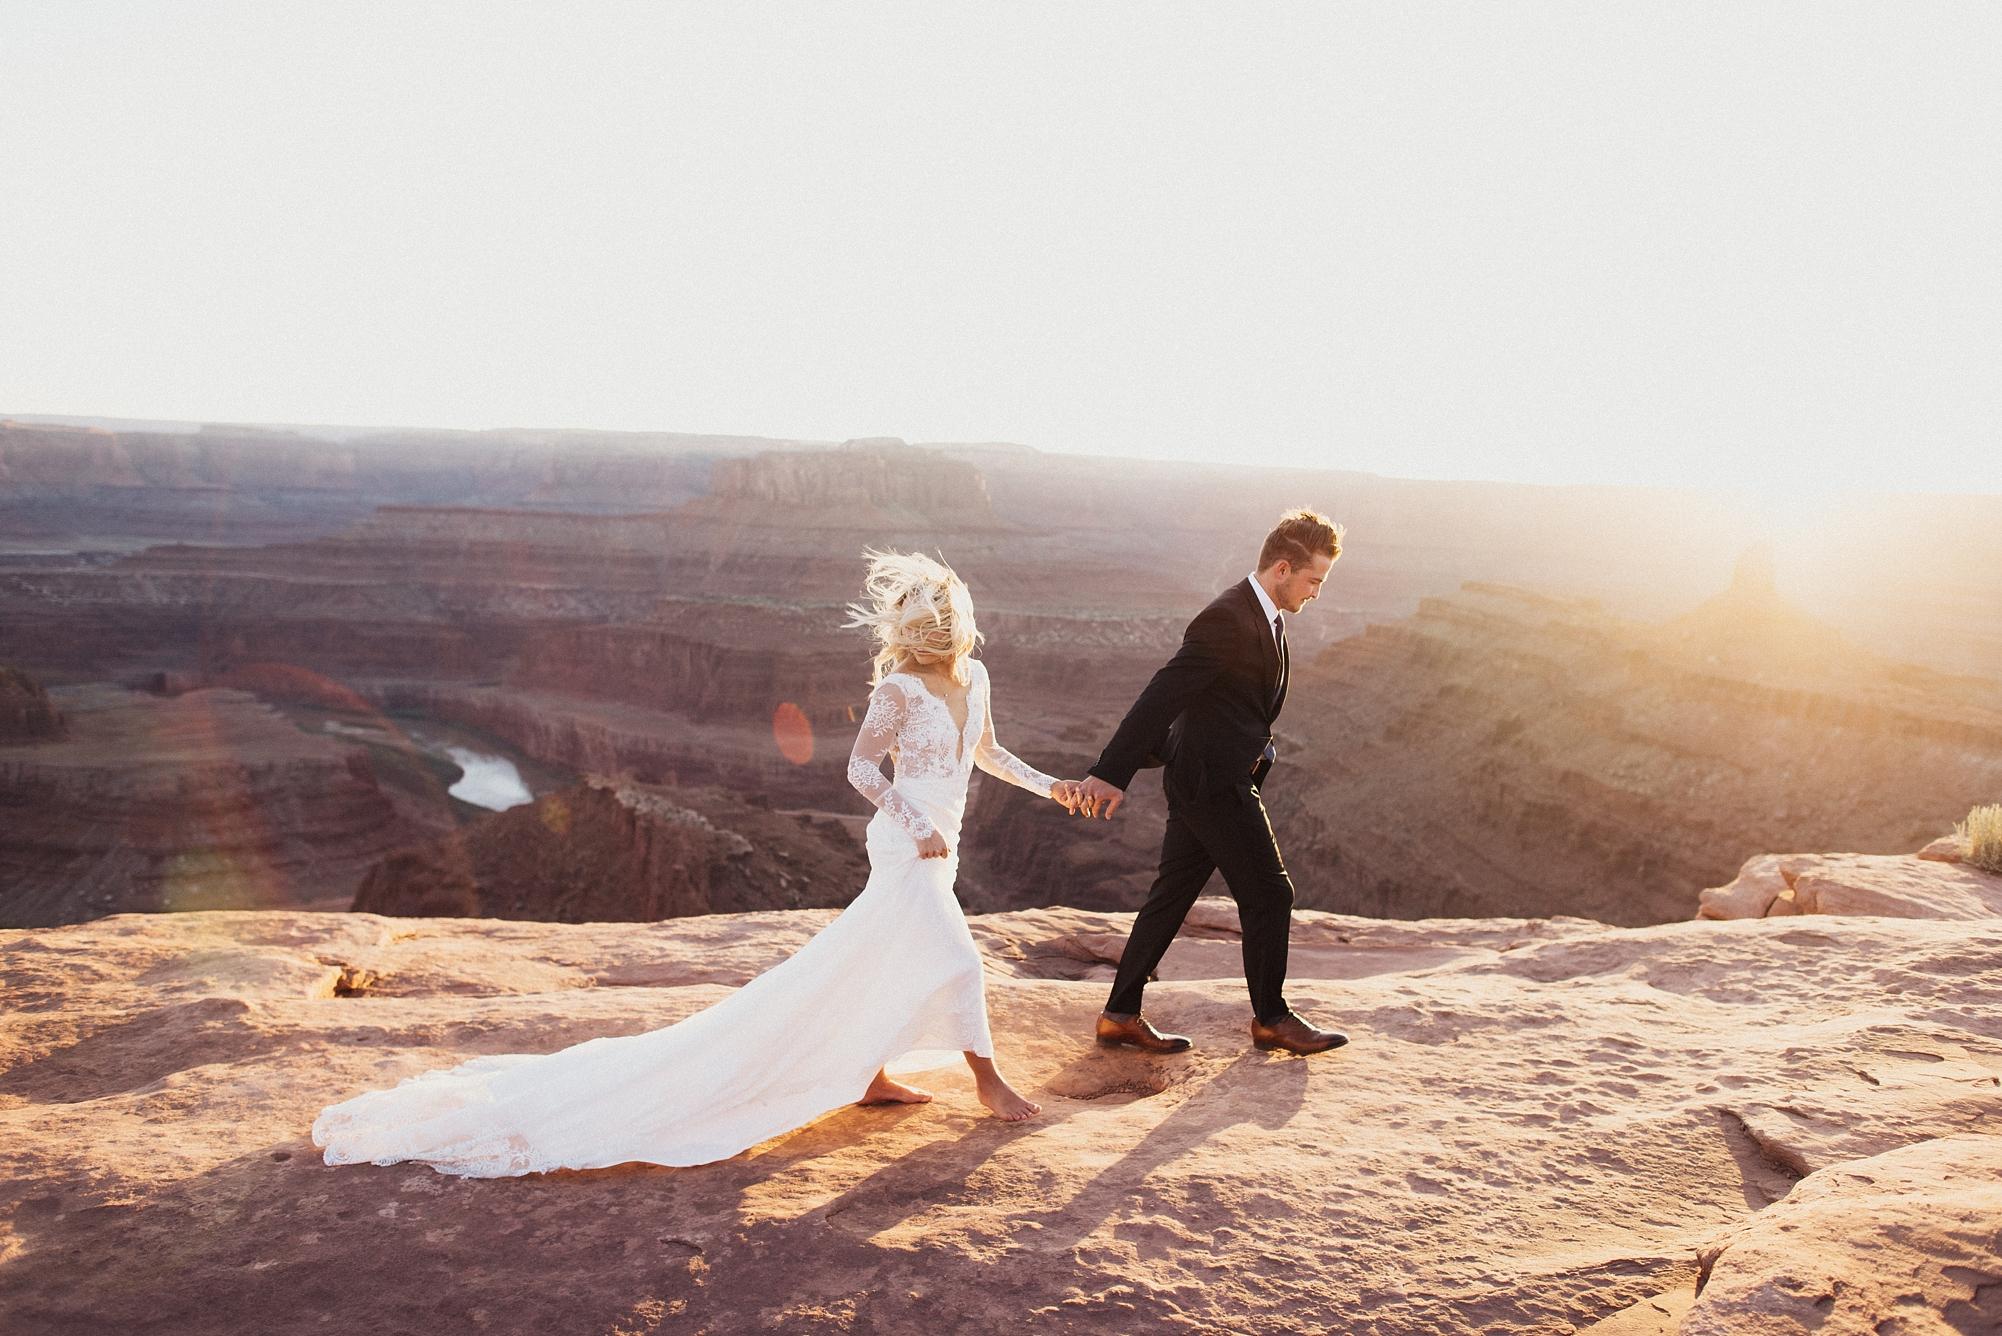 edenstraderphoto-weddingphotographer_1499.jpg